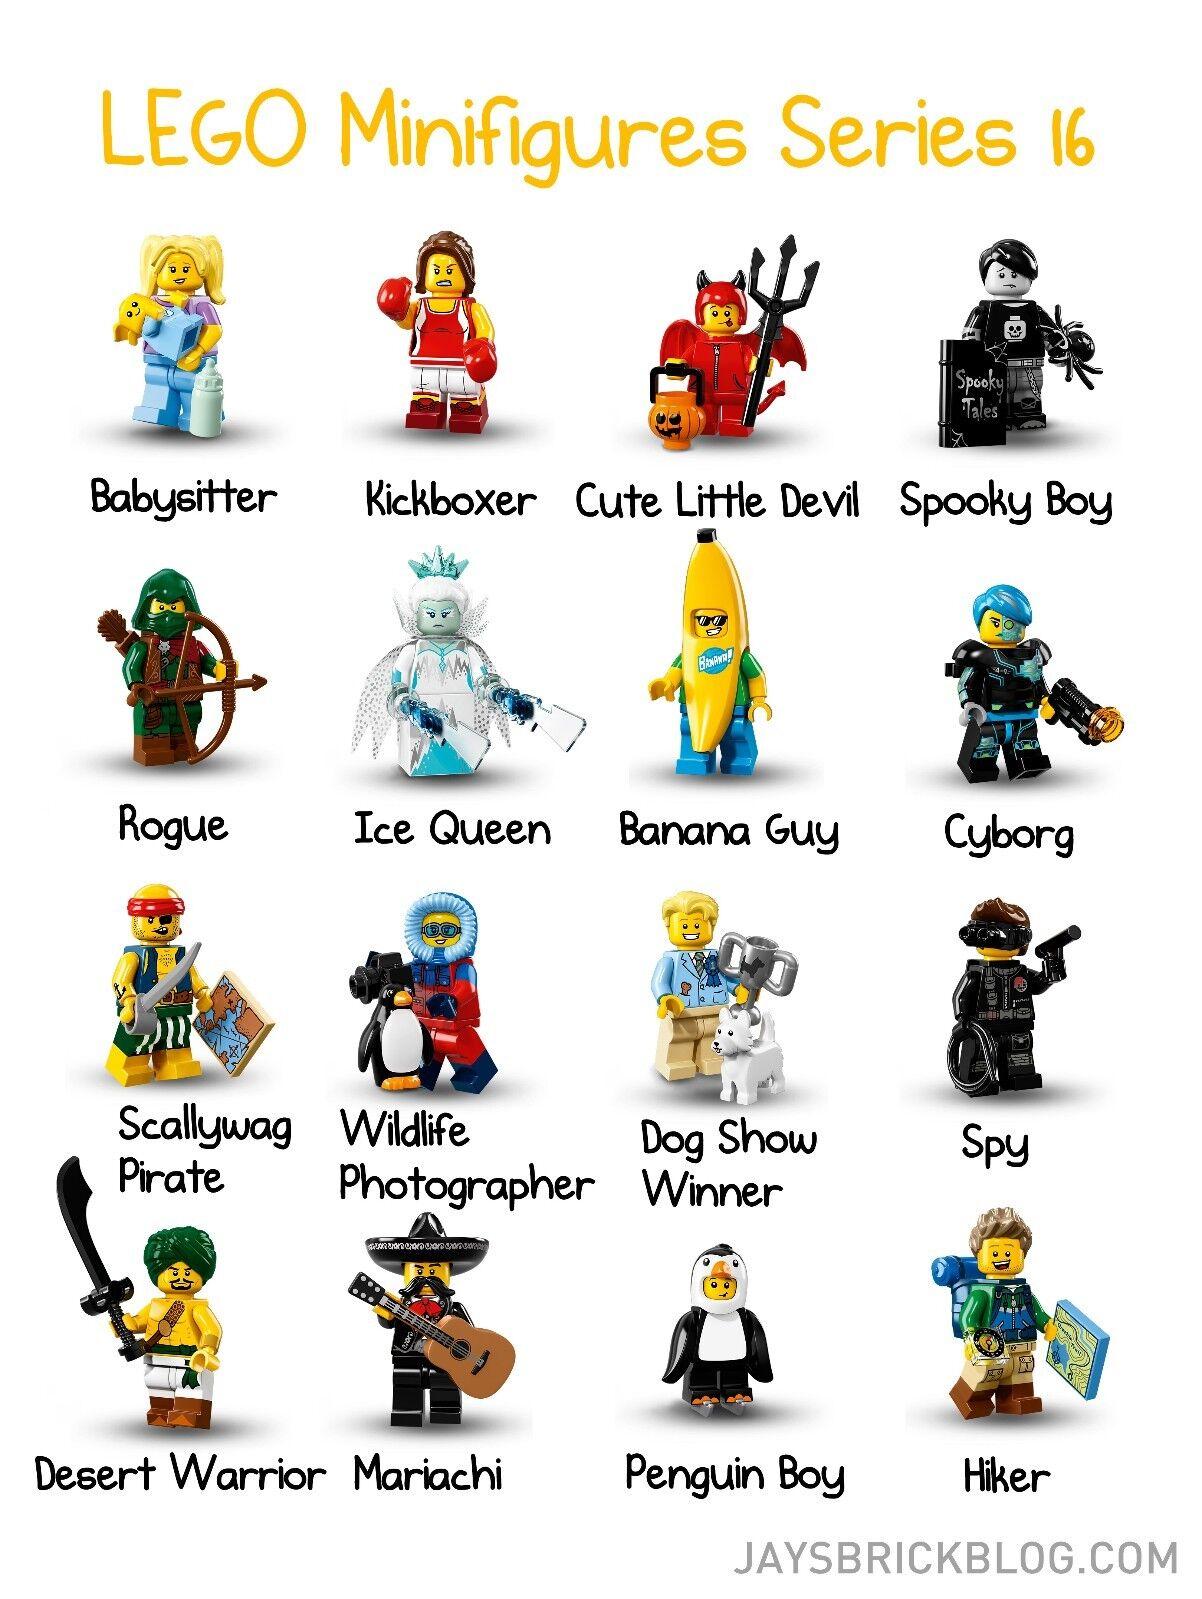 Lego Minifigure Serie 16 complete set with 16 fig OVP OVP OVP 016aee